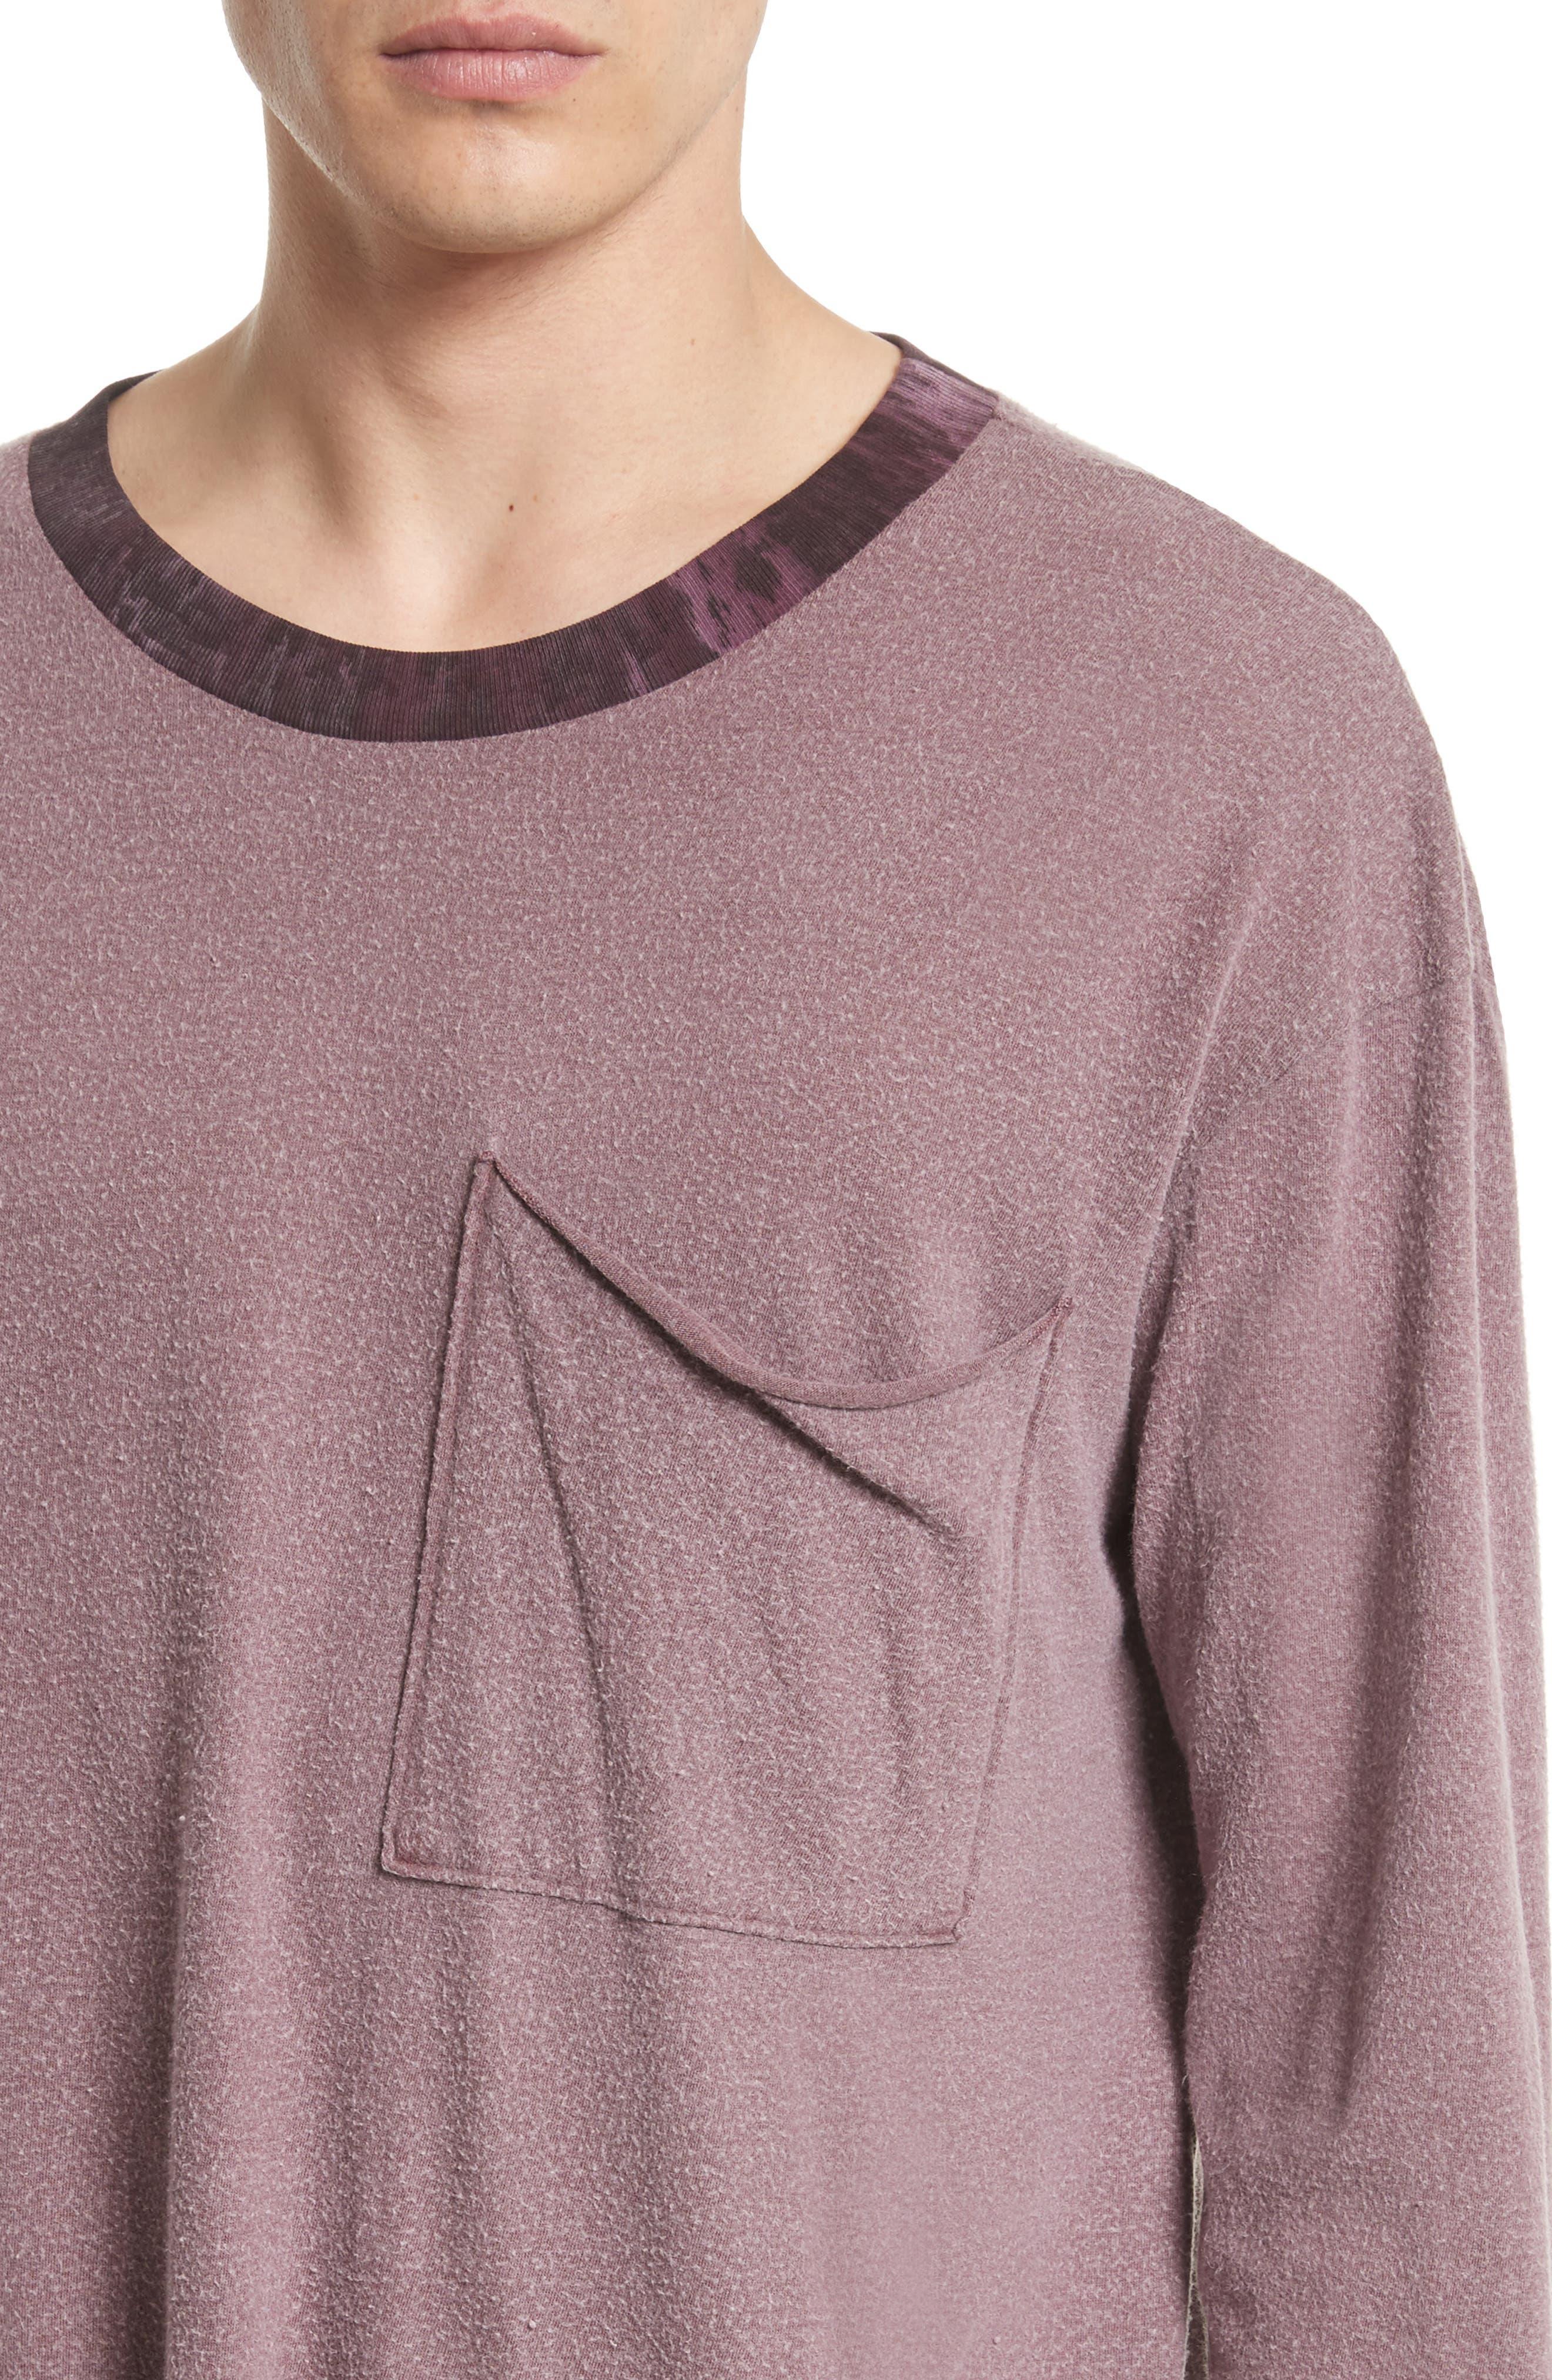 Tide Long Sleeve Pocket T-Shirt,                             Alternate thumbnail 4, color,                             649